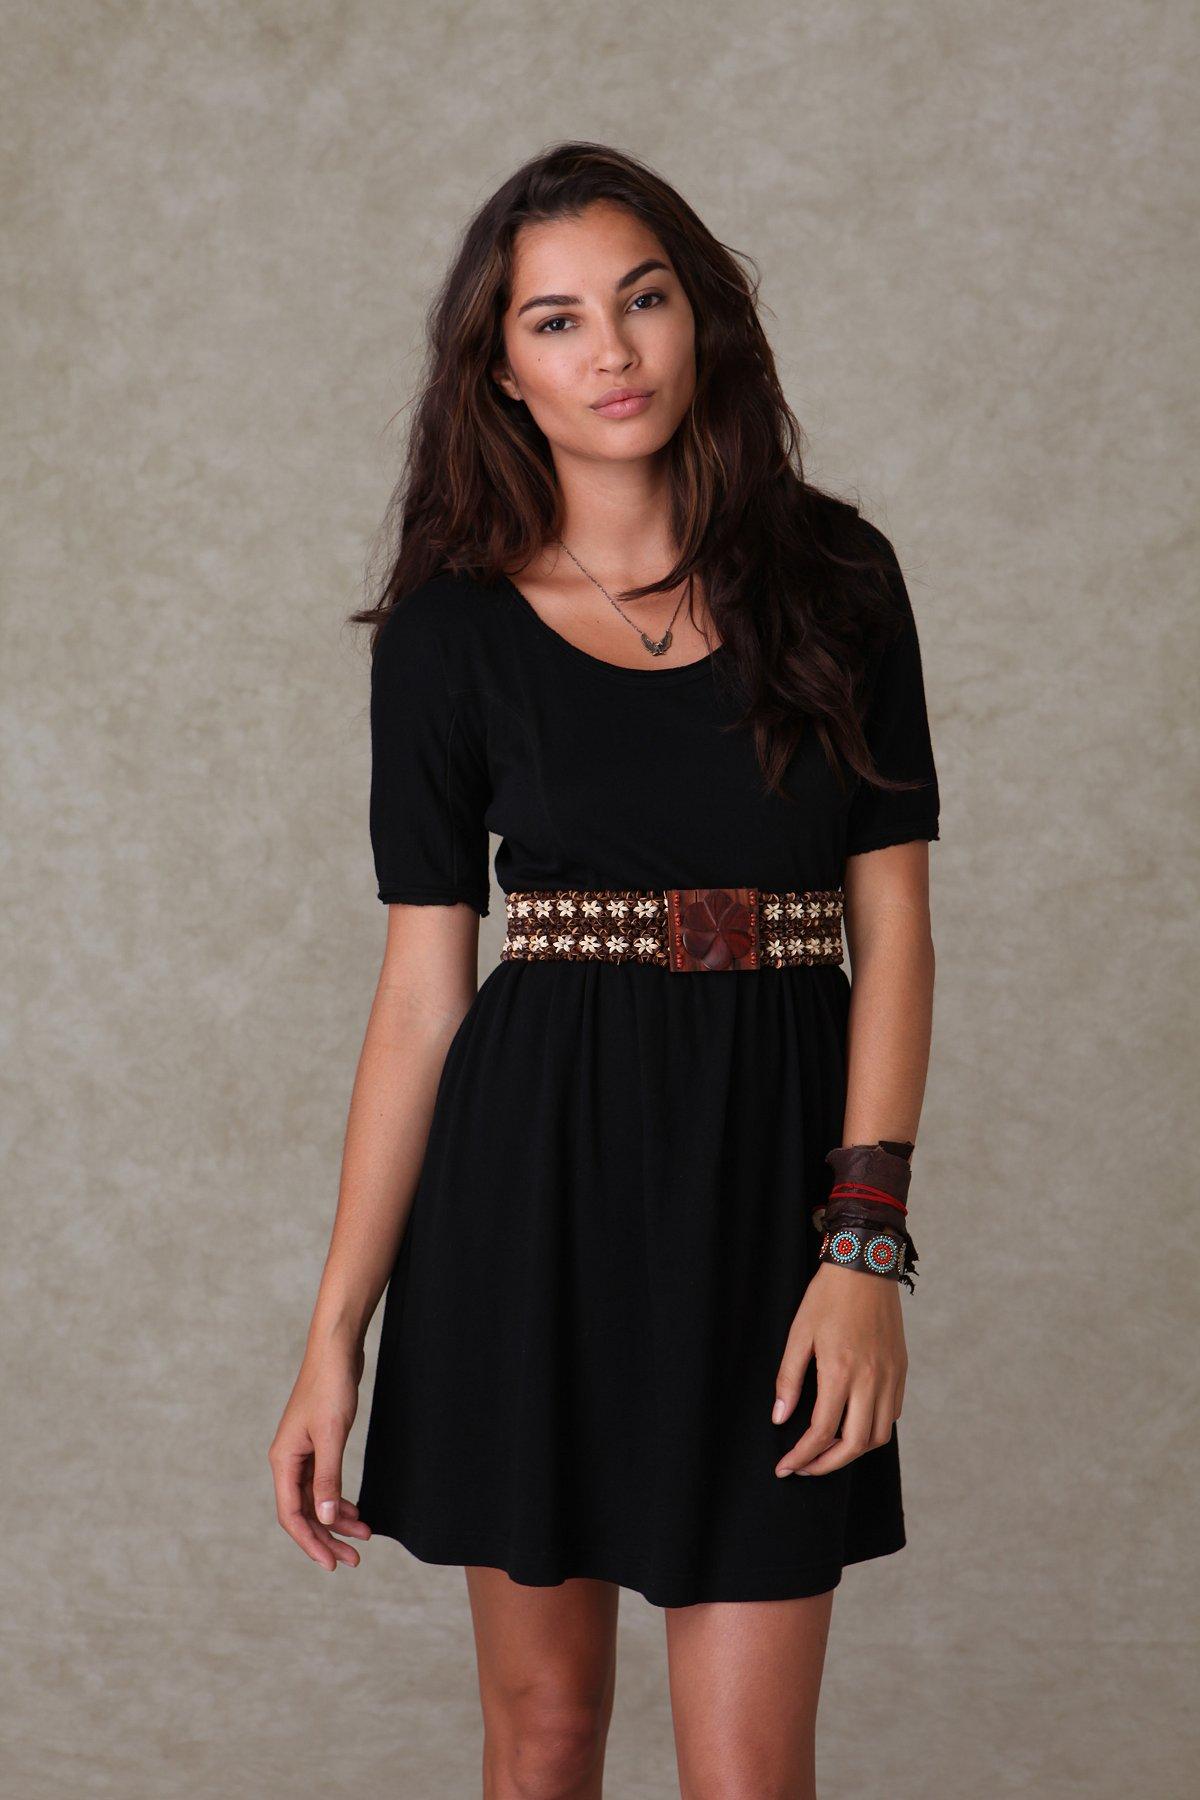 List of Favorites Dress